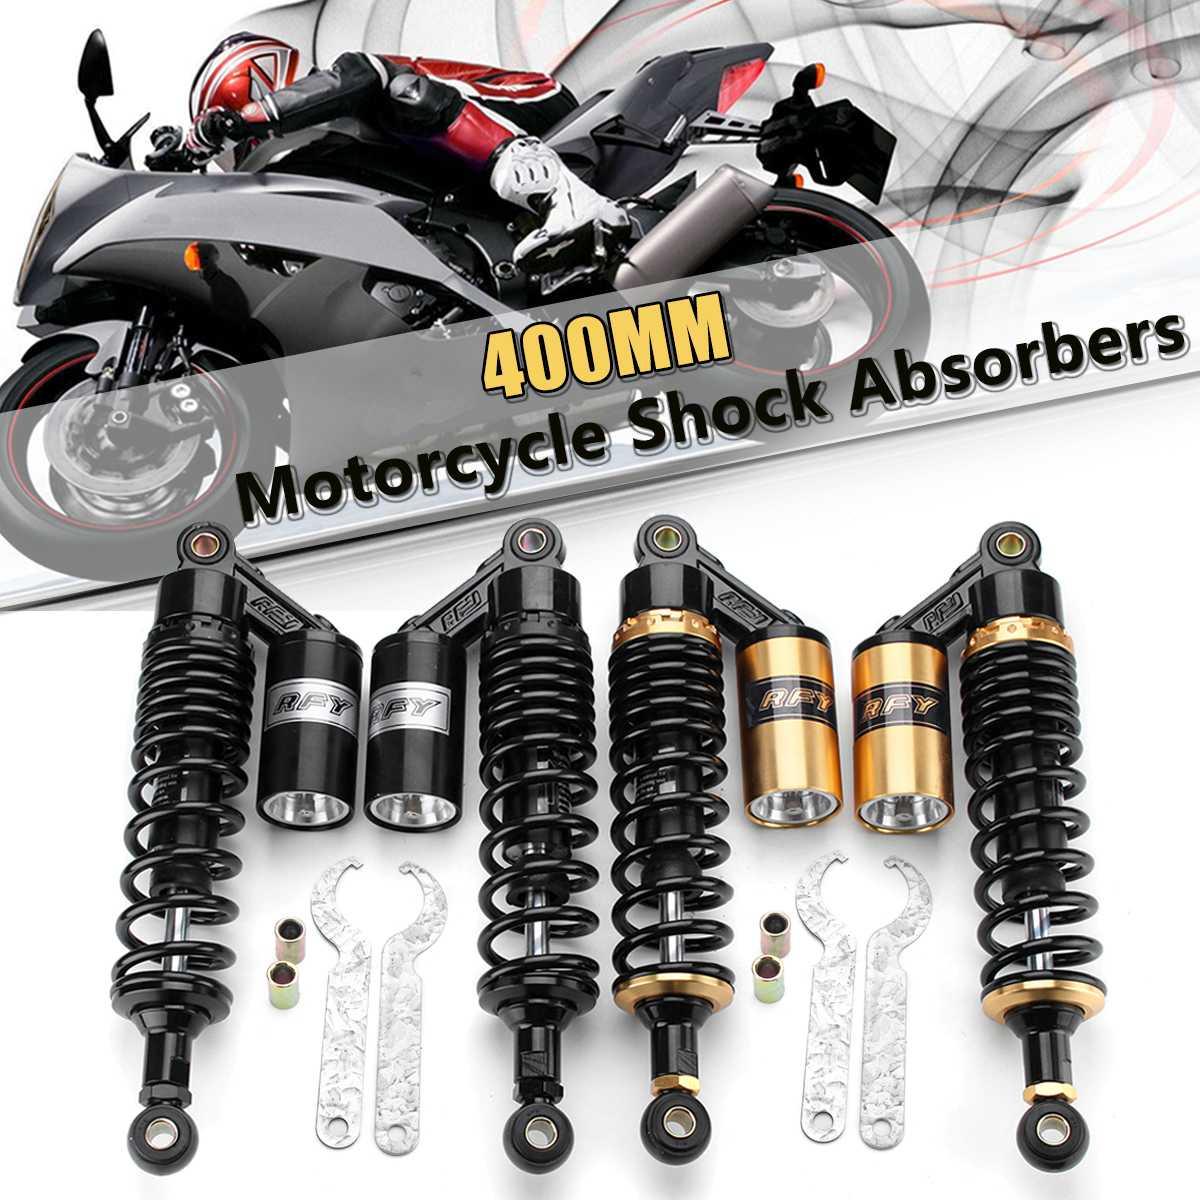 Rear Suspension Air Shock Absorber Fork Head for Motorcycle ATV Quad Scooter Bumper Spring 10mm D30 400mm 415mm 430mm,400mm